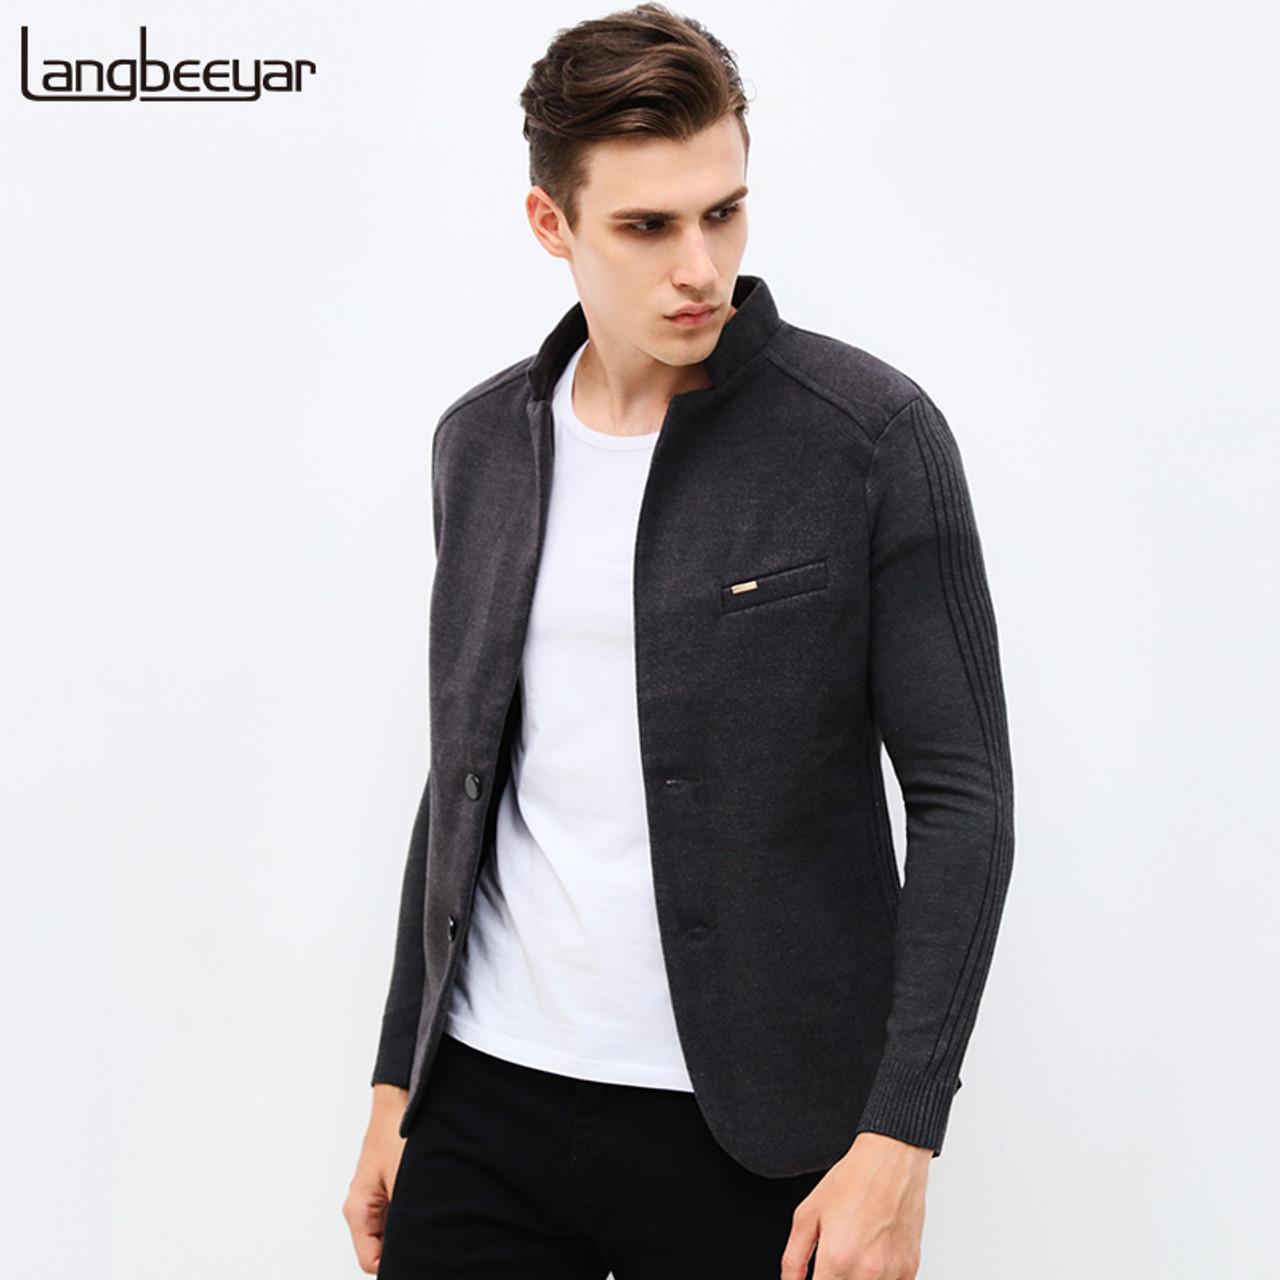 4f9ef20b 2018 New Autumn Winter Fashion Brand Unique Mens Blazer Jacket Woolen  Casual Blazer Slim Fit Patchwork Sleeve Men Suit Jacket